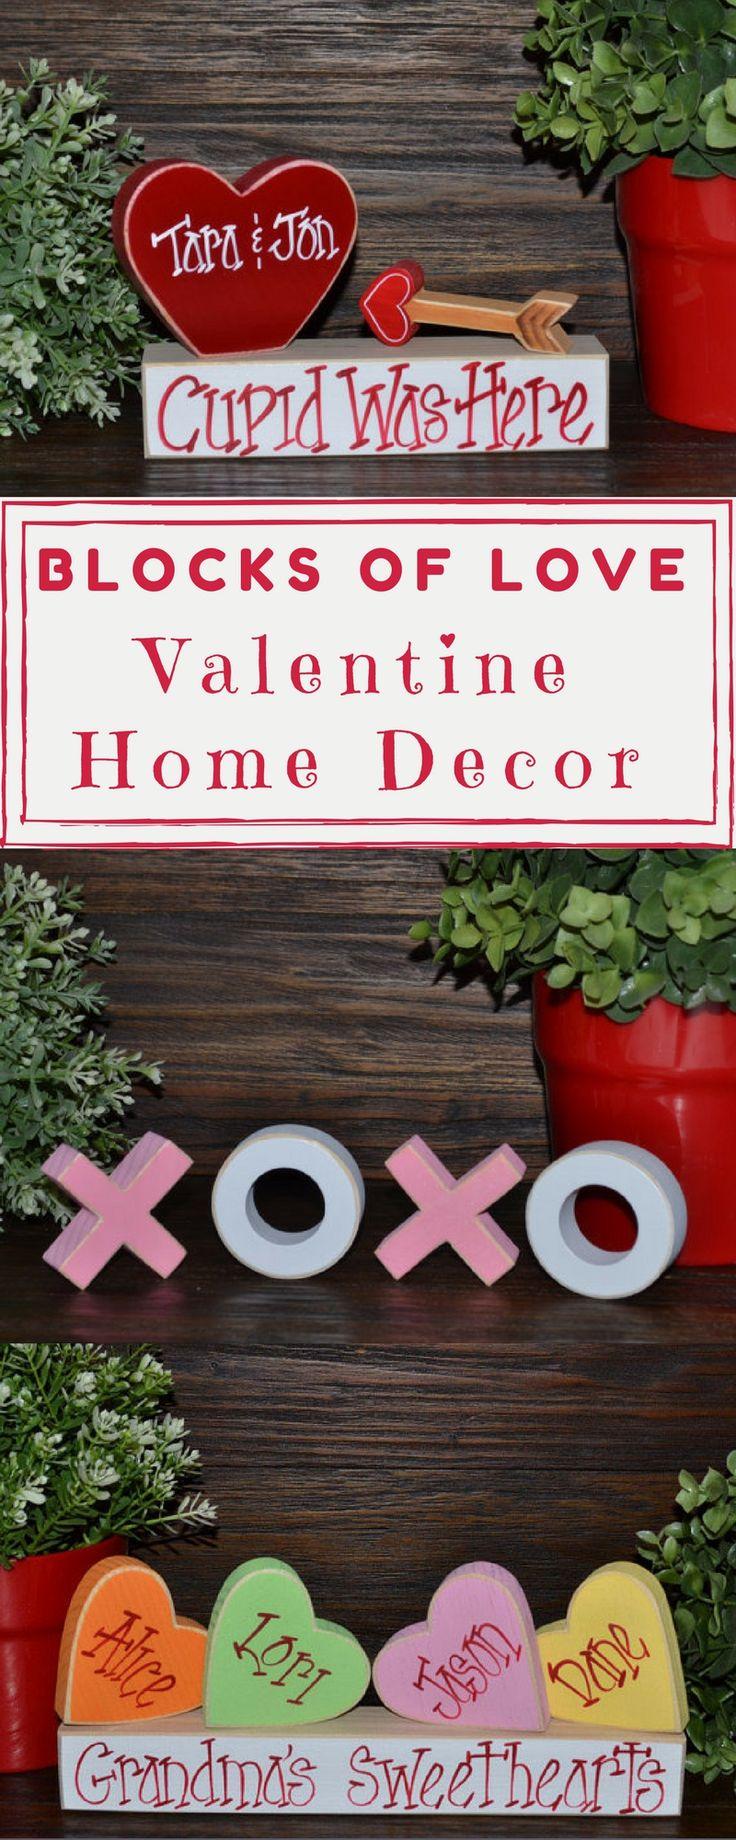 Decor,ValentineGlitter Block,home decor,valentine decor, XOXOHugs,Hugs and Kisses, Hearts,Stacking Blocks,Primitive Blocks,valentines decor,holidays,decoration,word blocks #ad